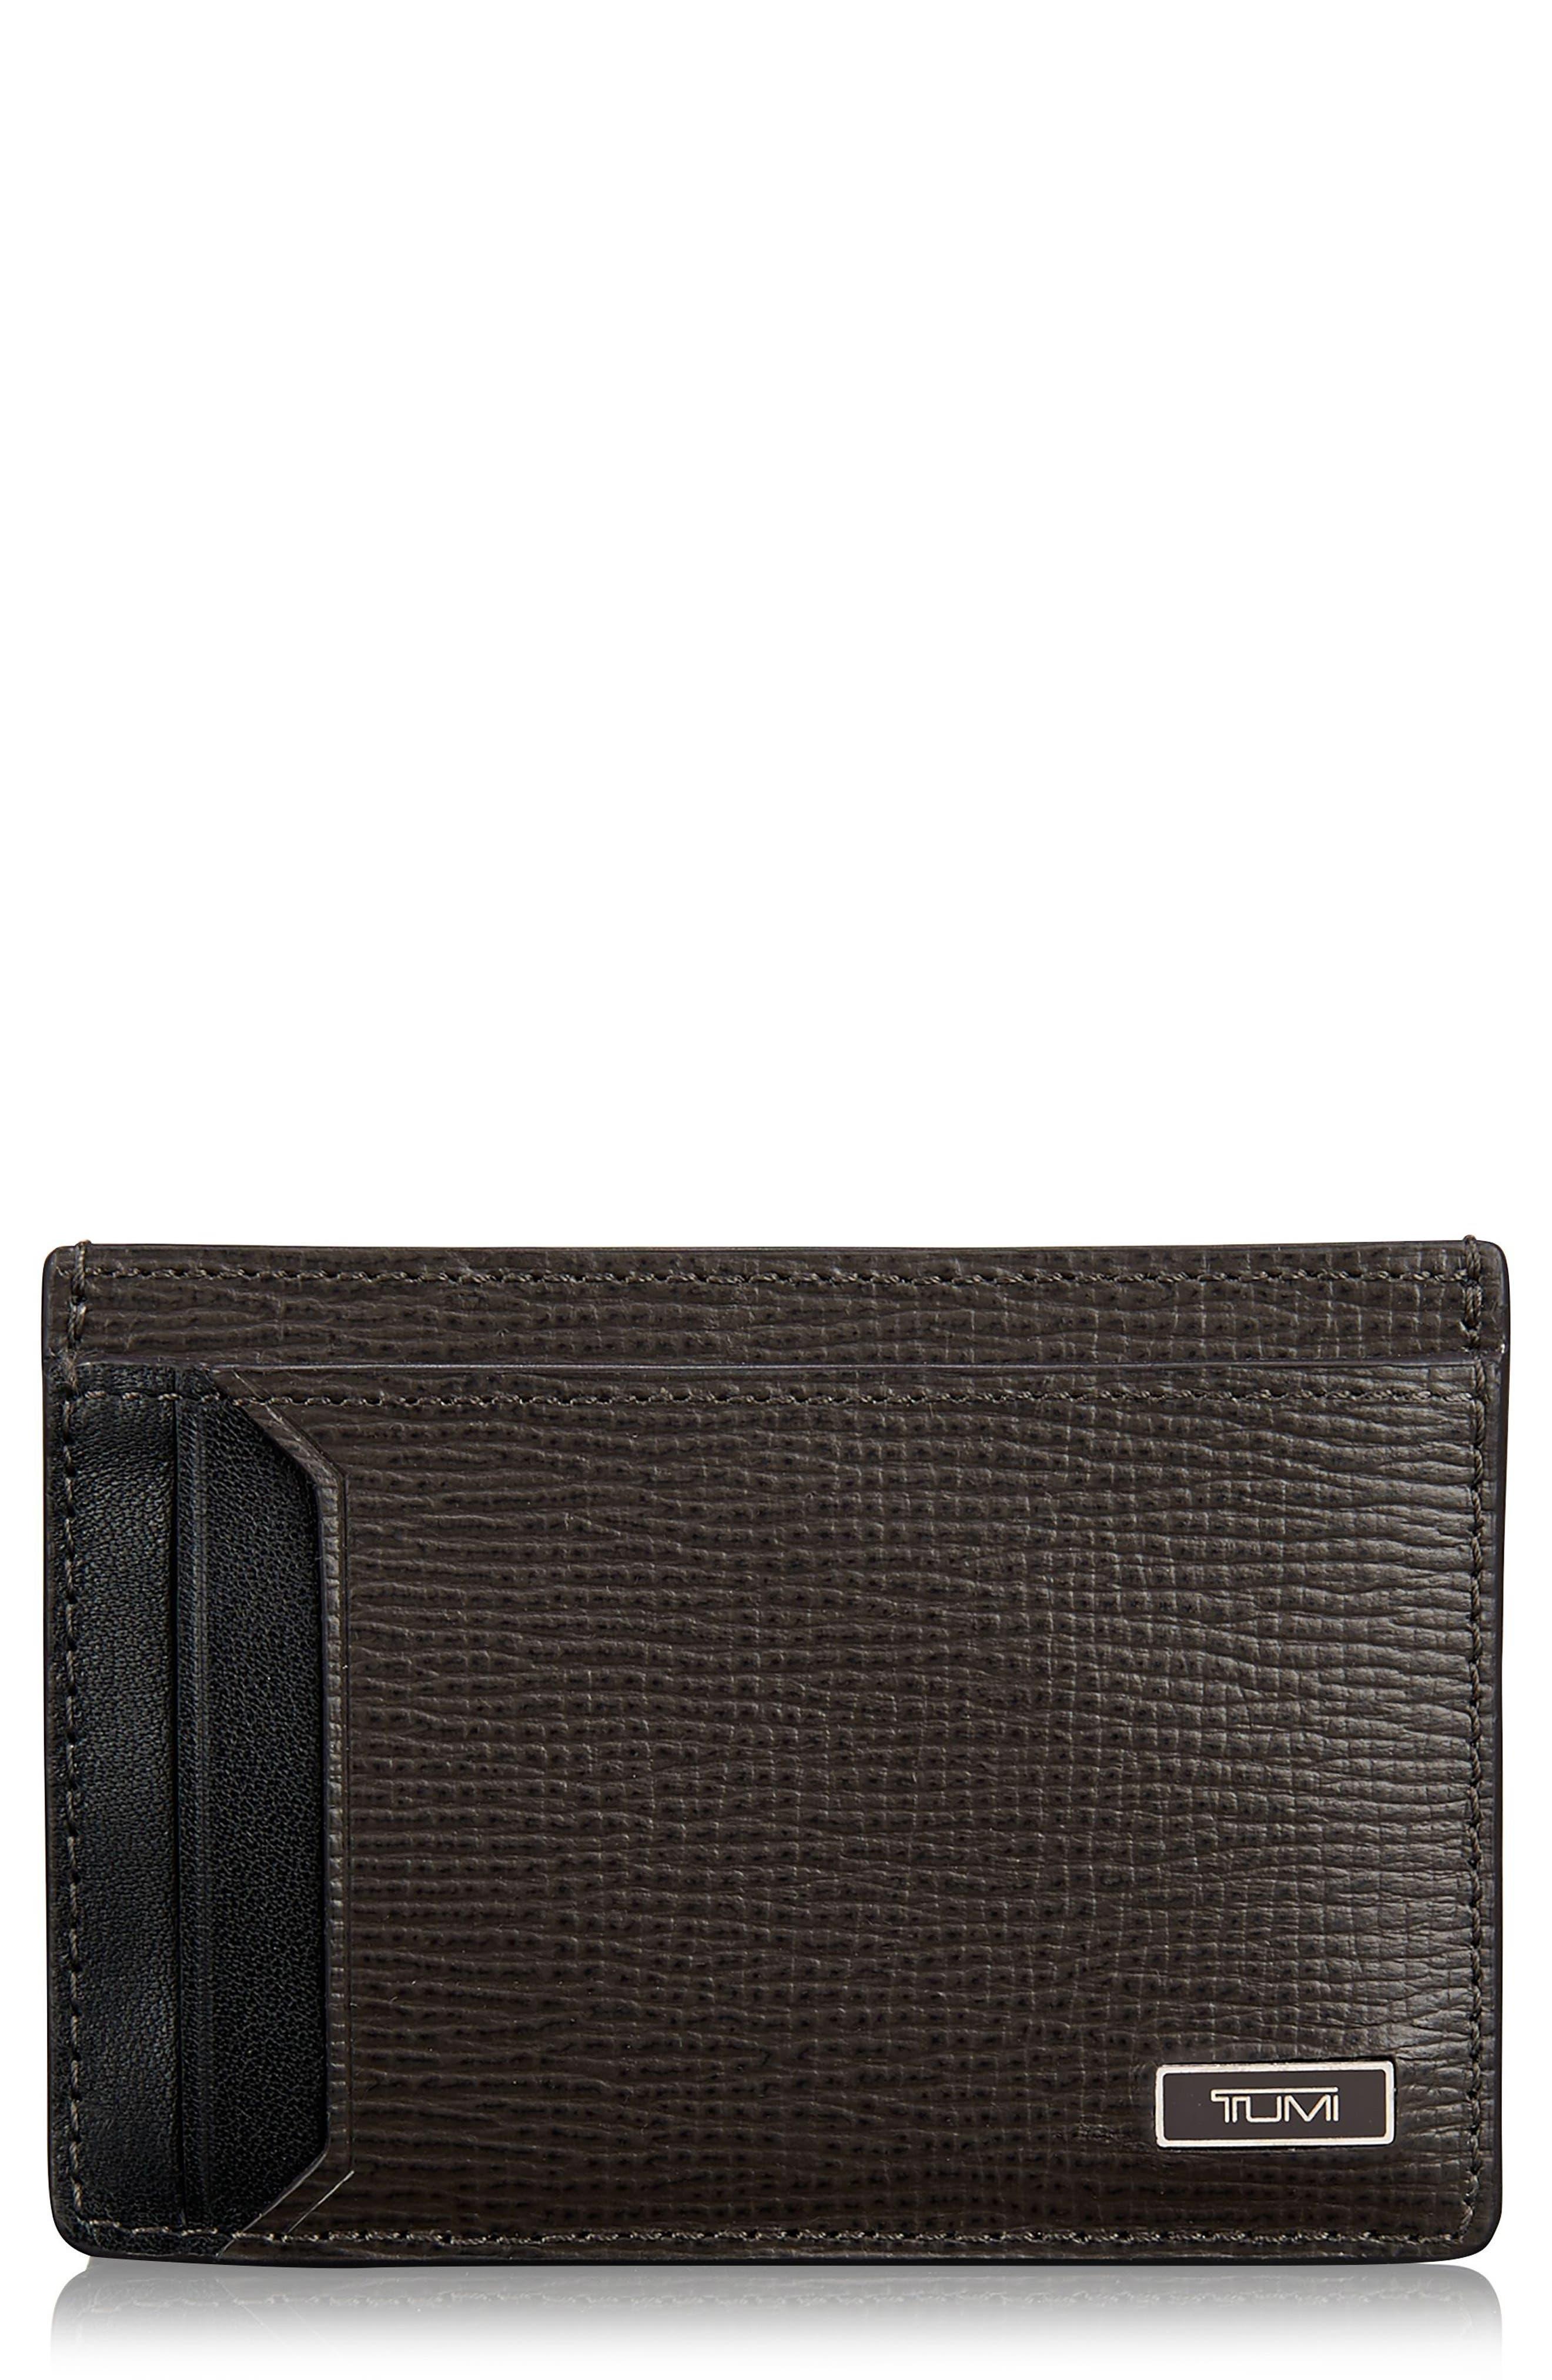 Alternate Image 1 Selected - Tumi Monaco Leather Money Clip Card Case